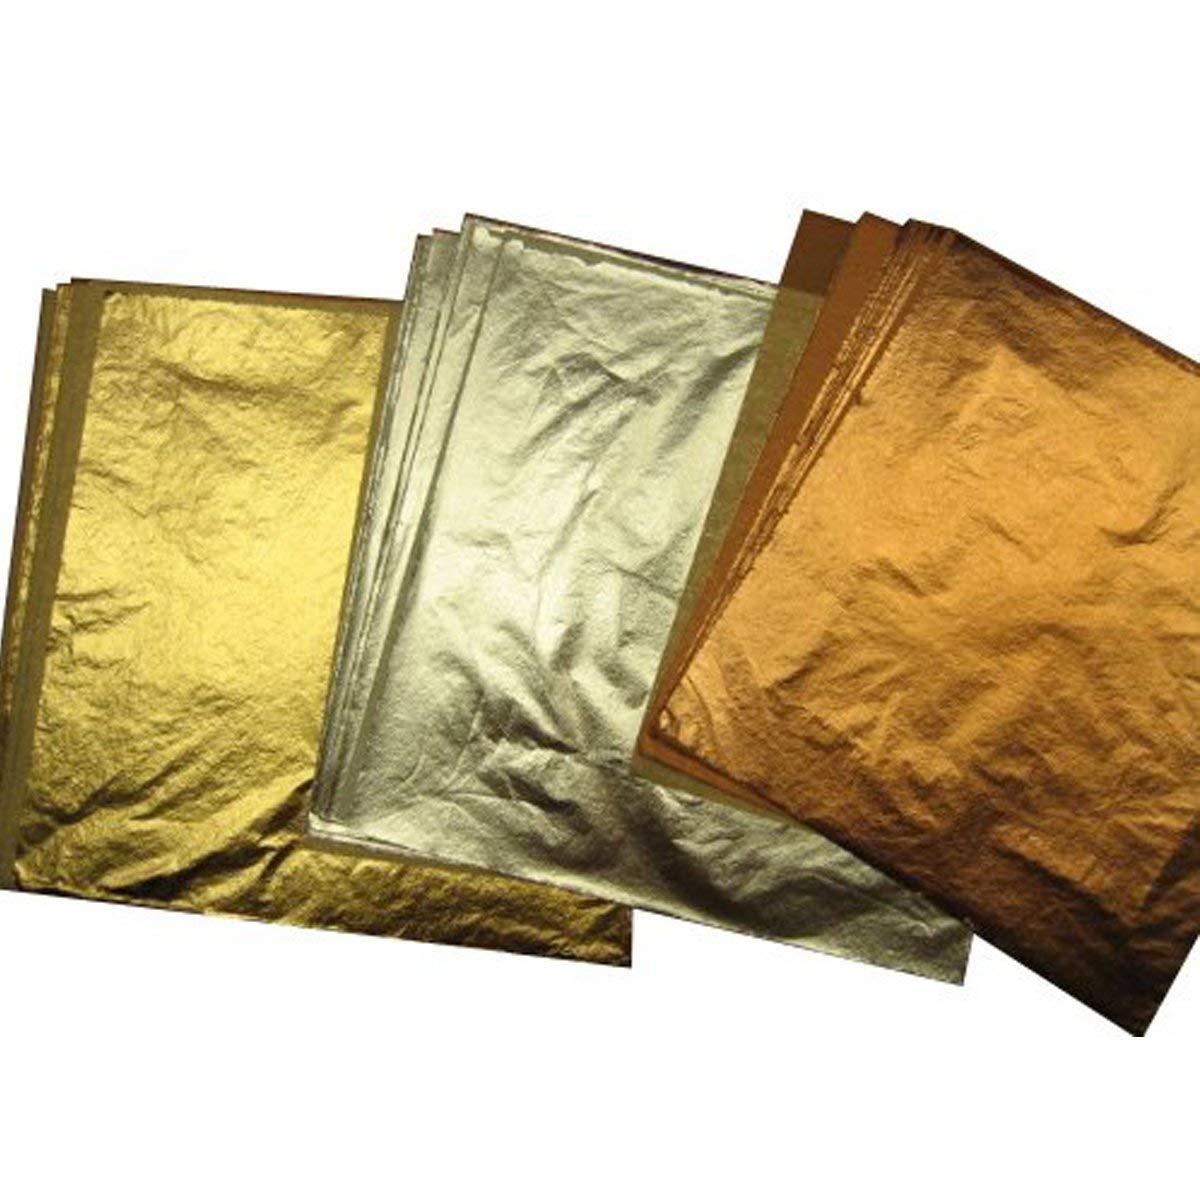 Copper Awakingdemi 100pcs Foil Leaf Leaves Sheets Foil Paper for Gilding Art Craft Decor 5.51 X 5.51inch